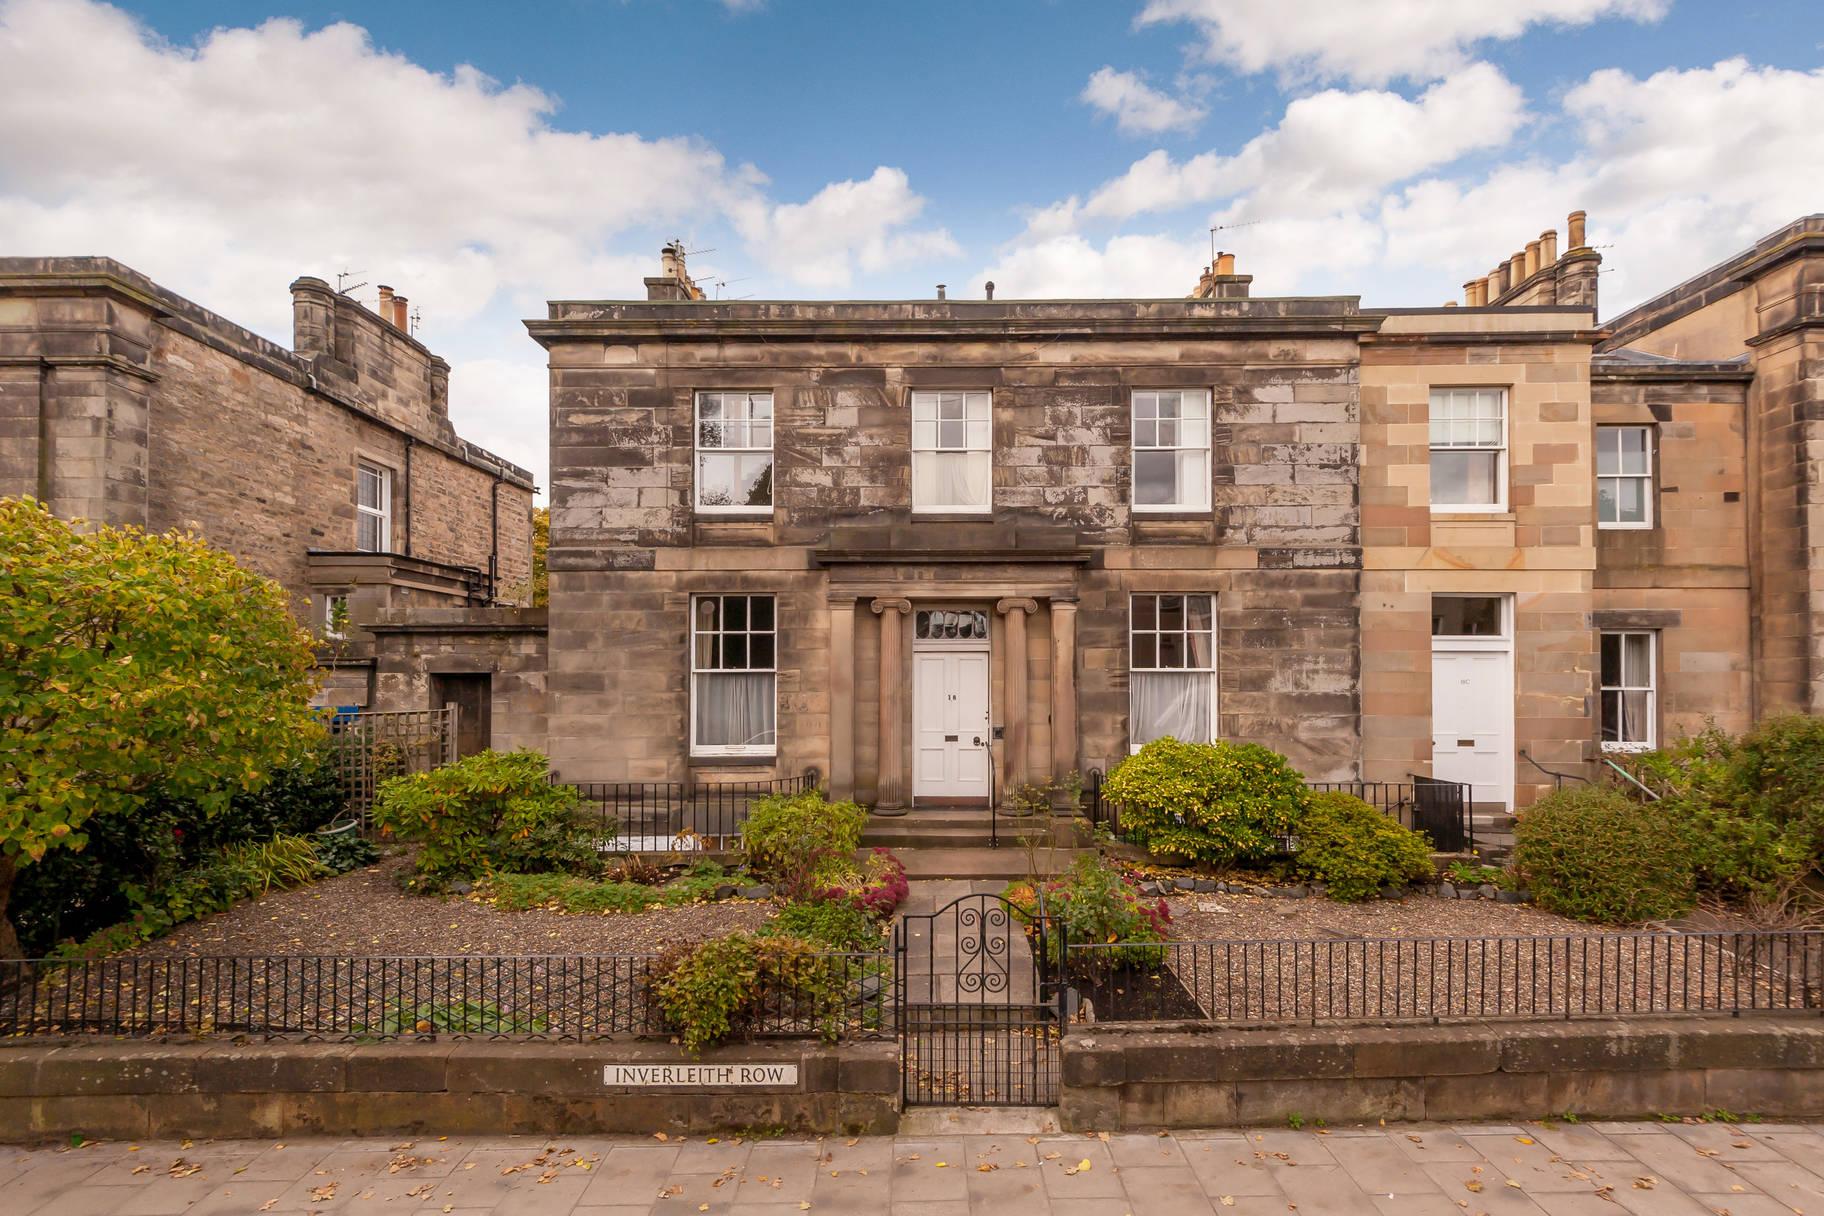 18 Inverleith Row, Edinburgh, EH3 5LS